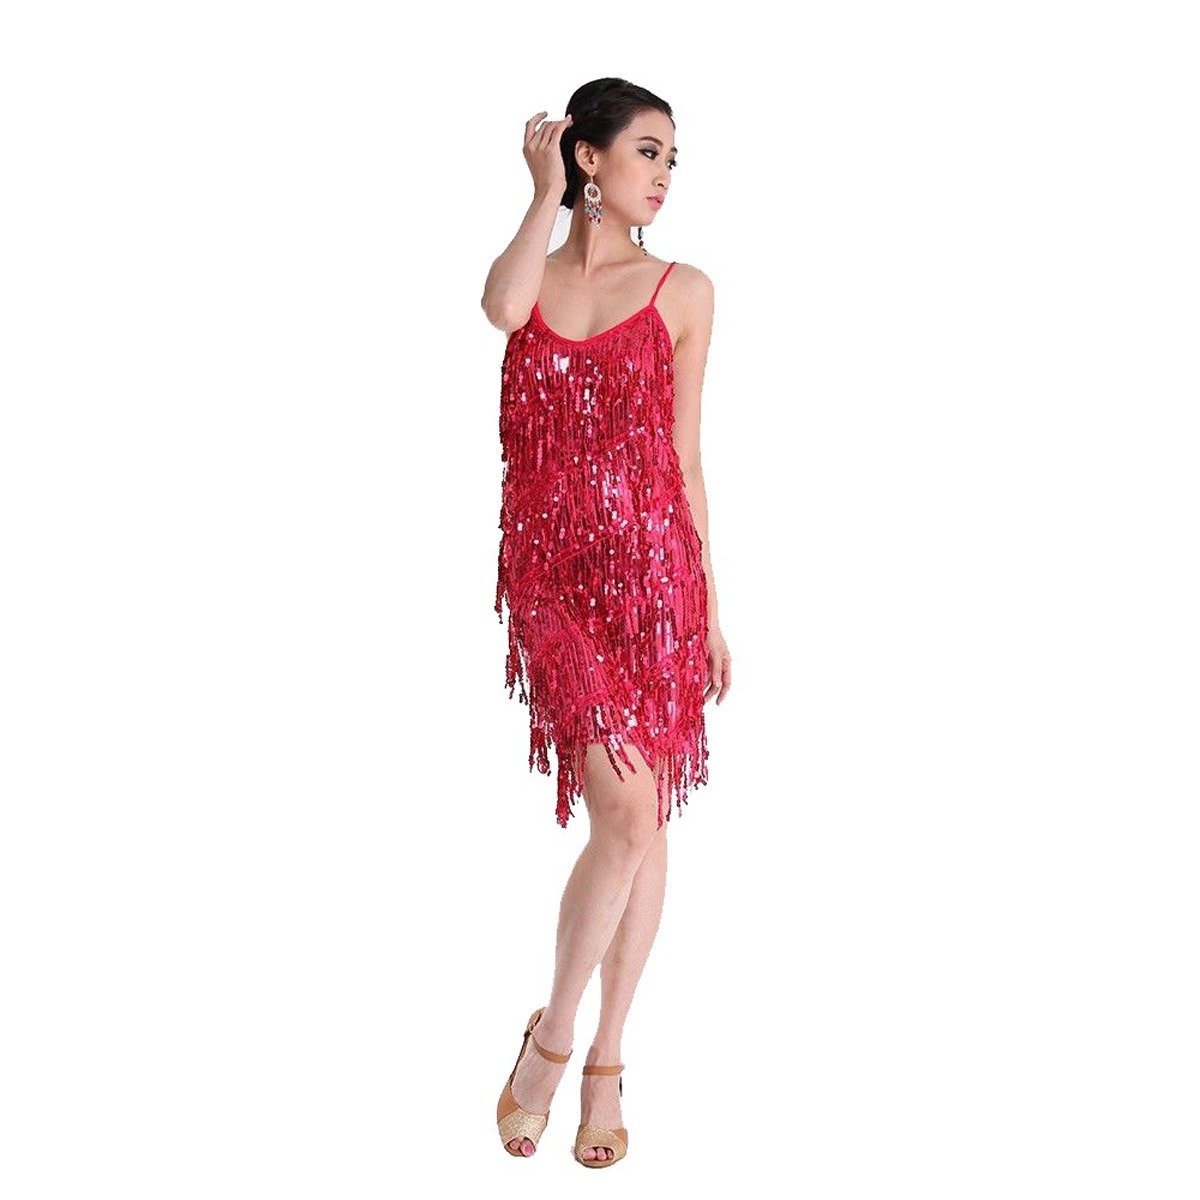 Amazon.com: Pilot-trade - Vestido de baile para mujer con ...